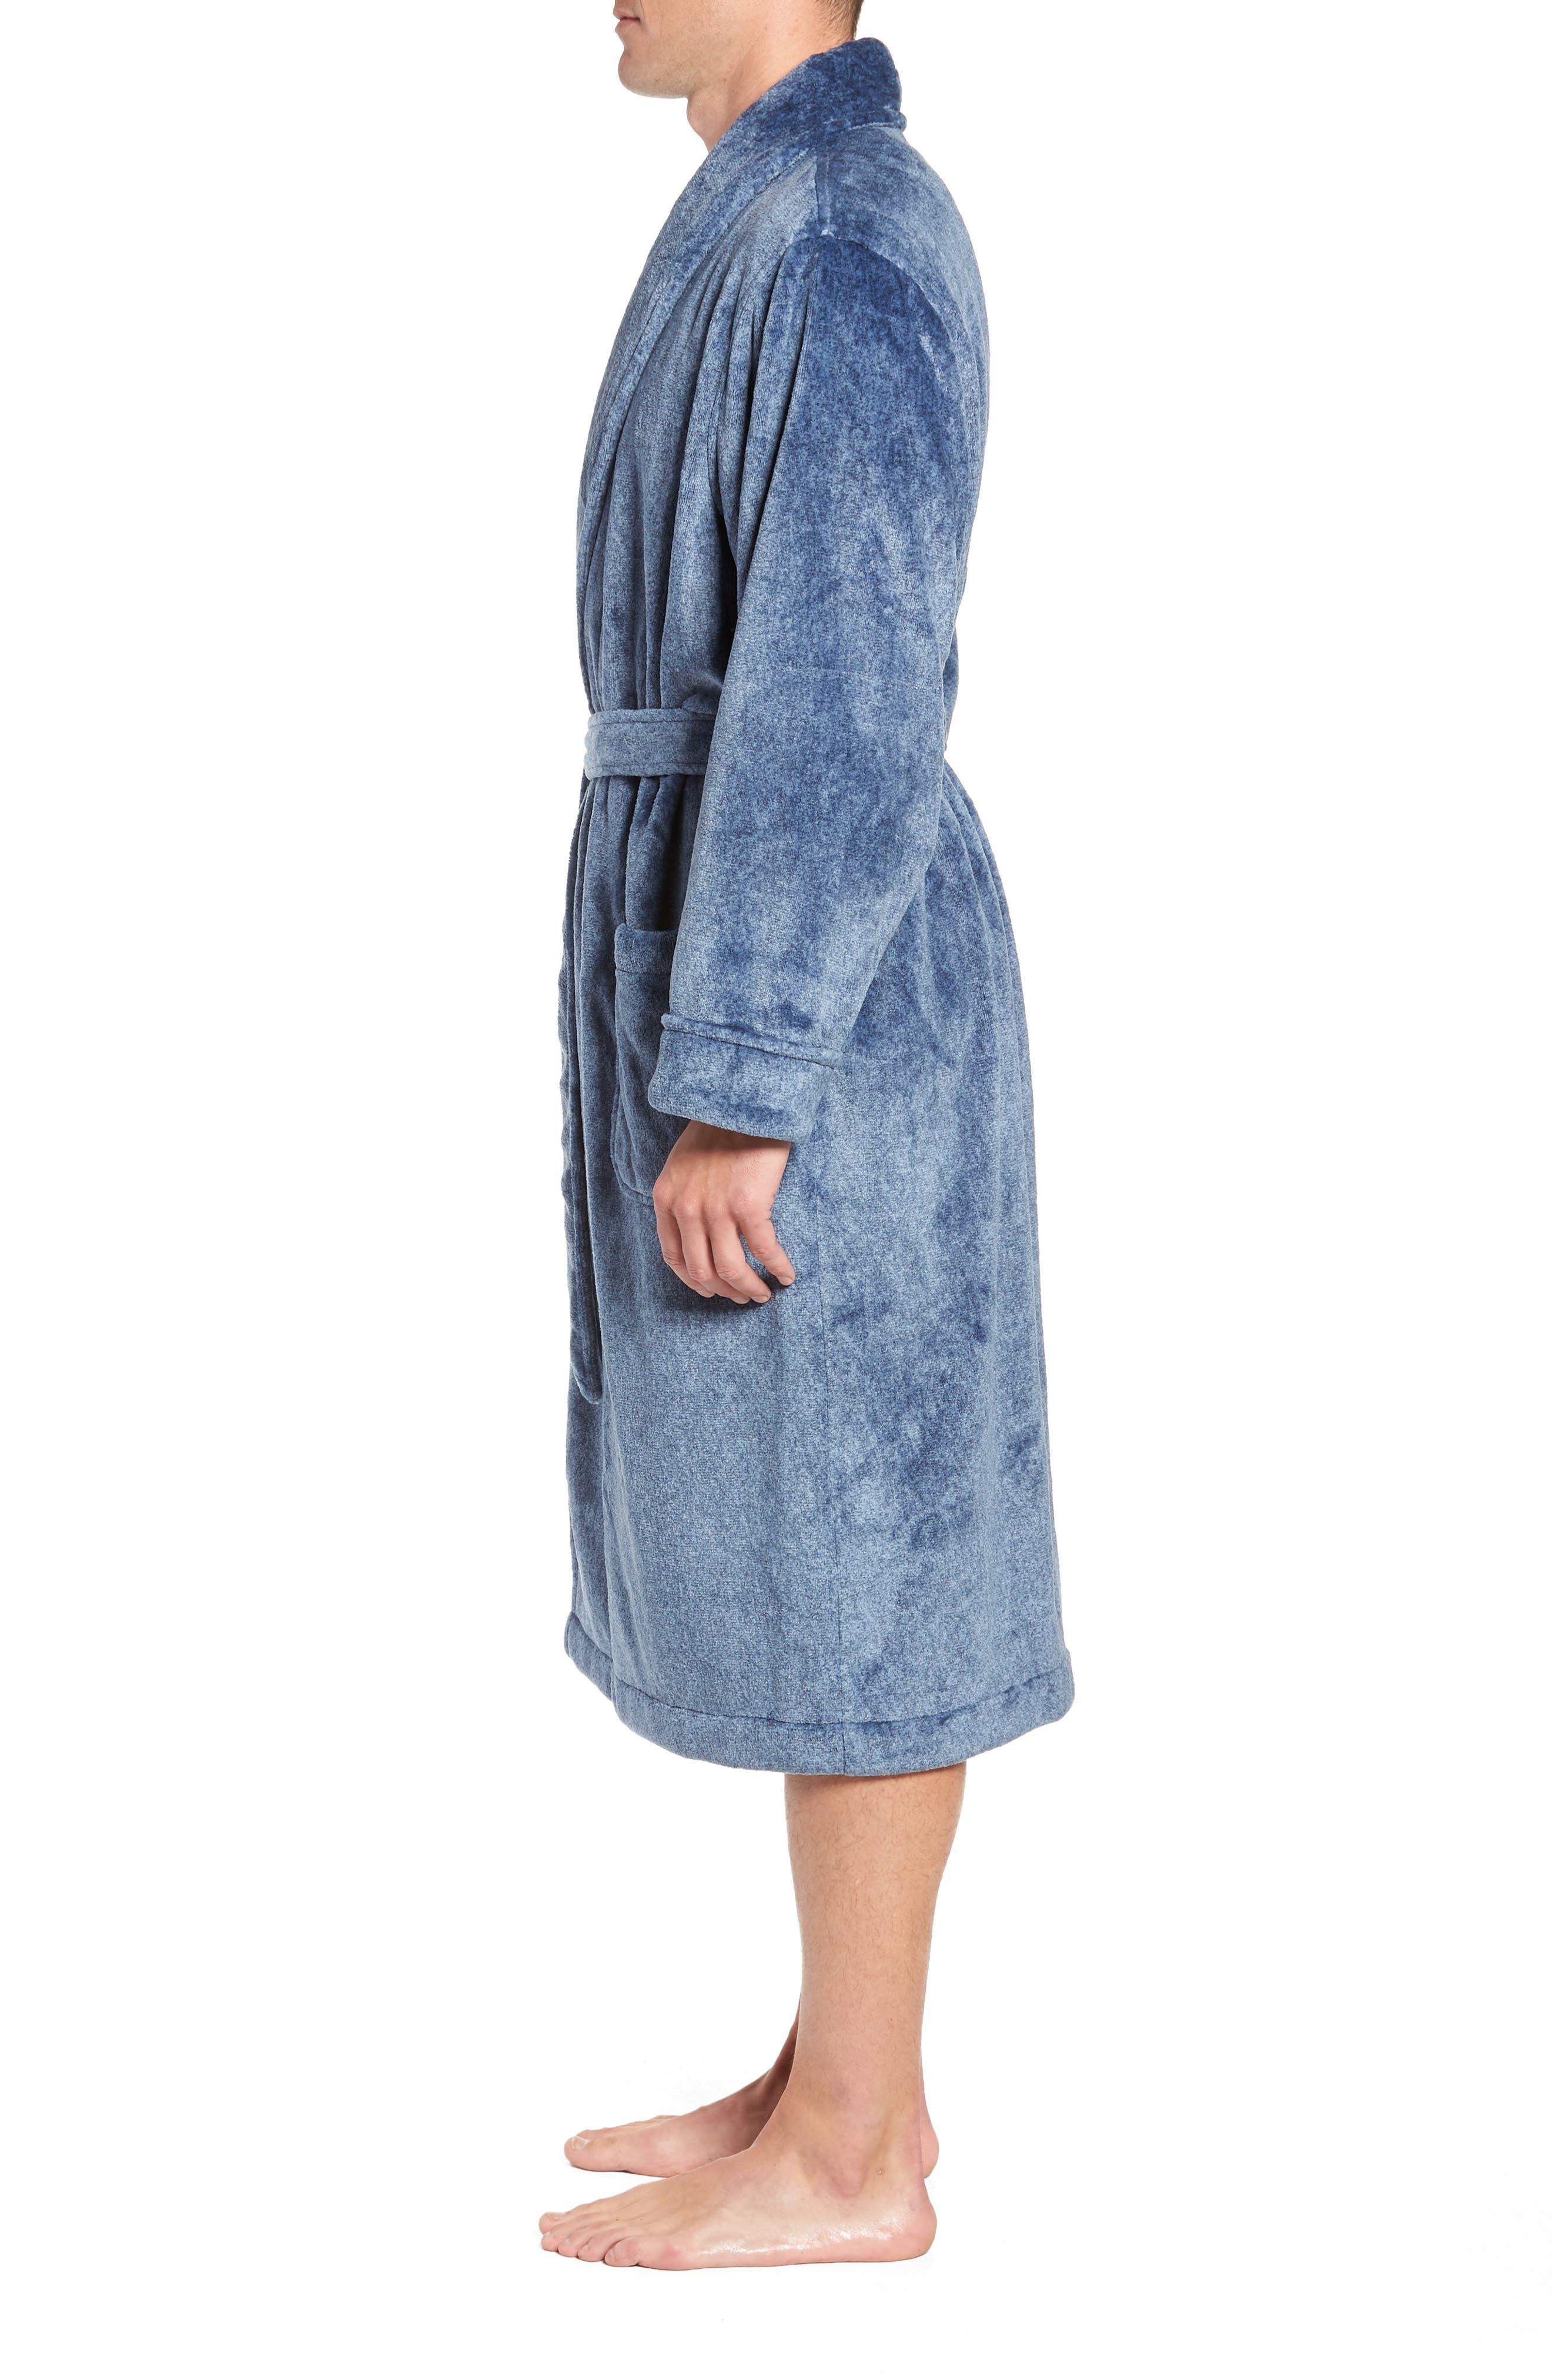 Heathered Fleece Robe,                             Alternate thumbnail 3, color,                             BLUE CORONET